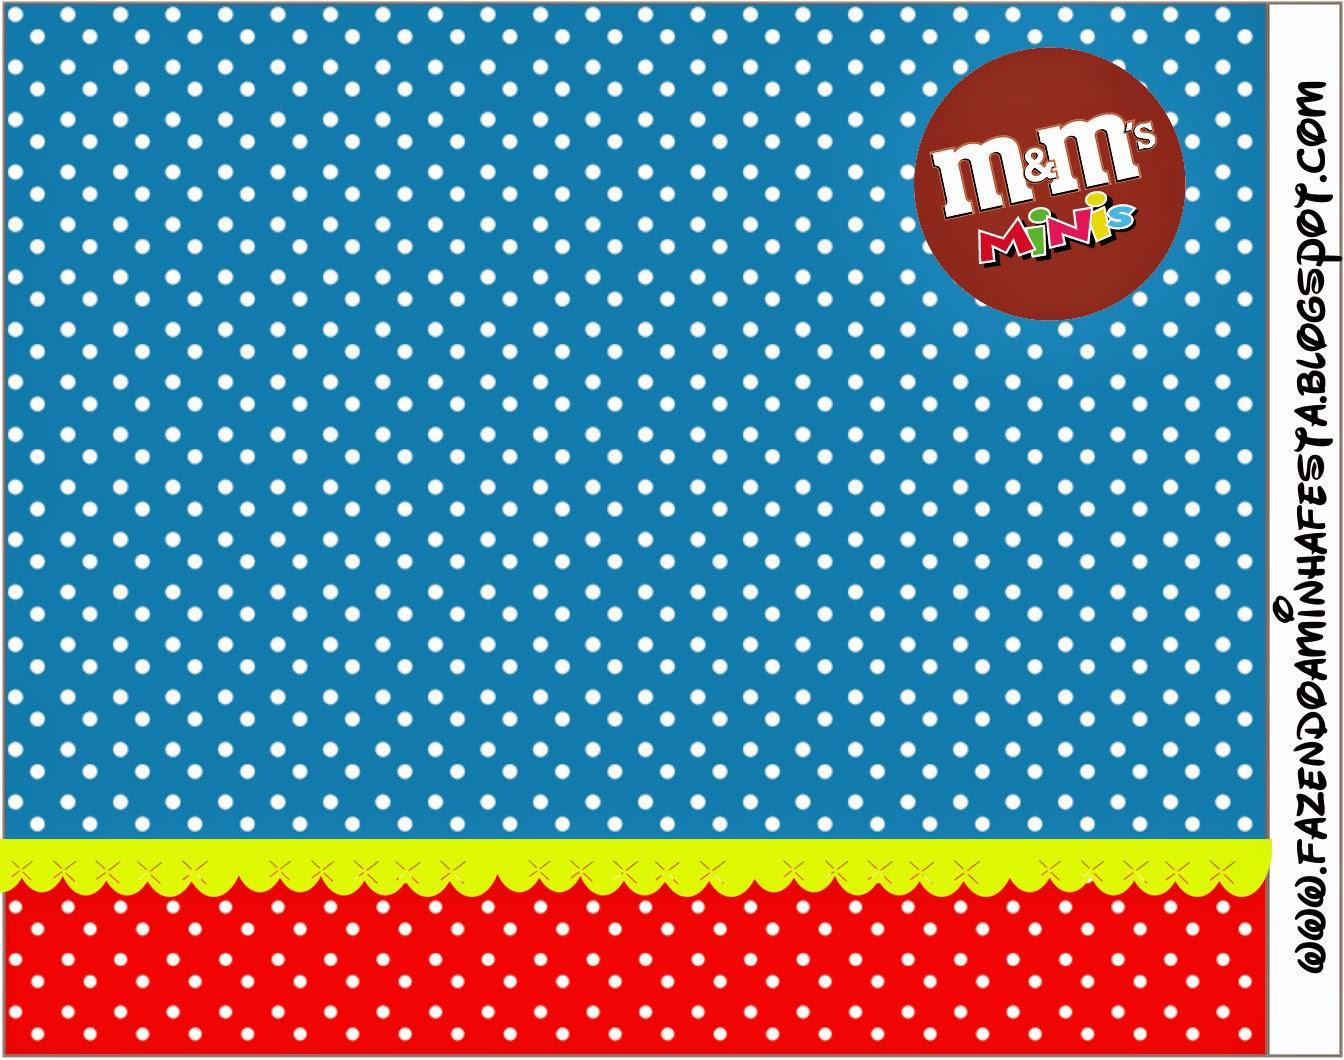 Etiqueta M&M de Rojo, Amarillo y Azul para imprimir gratis.